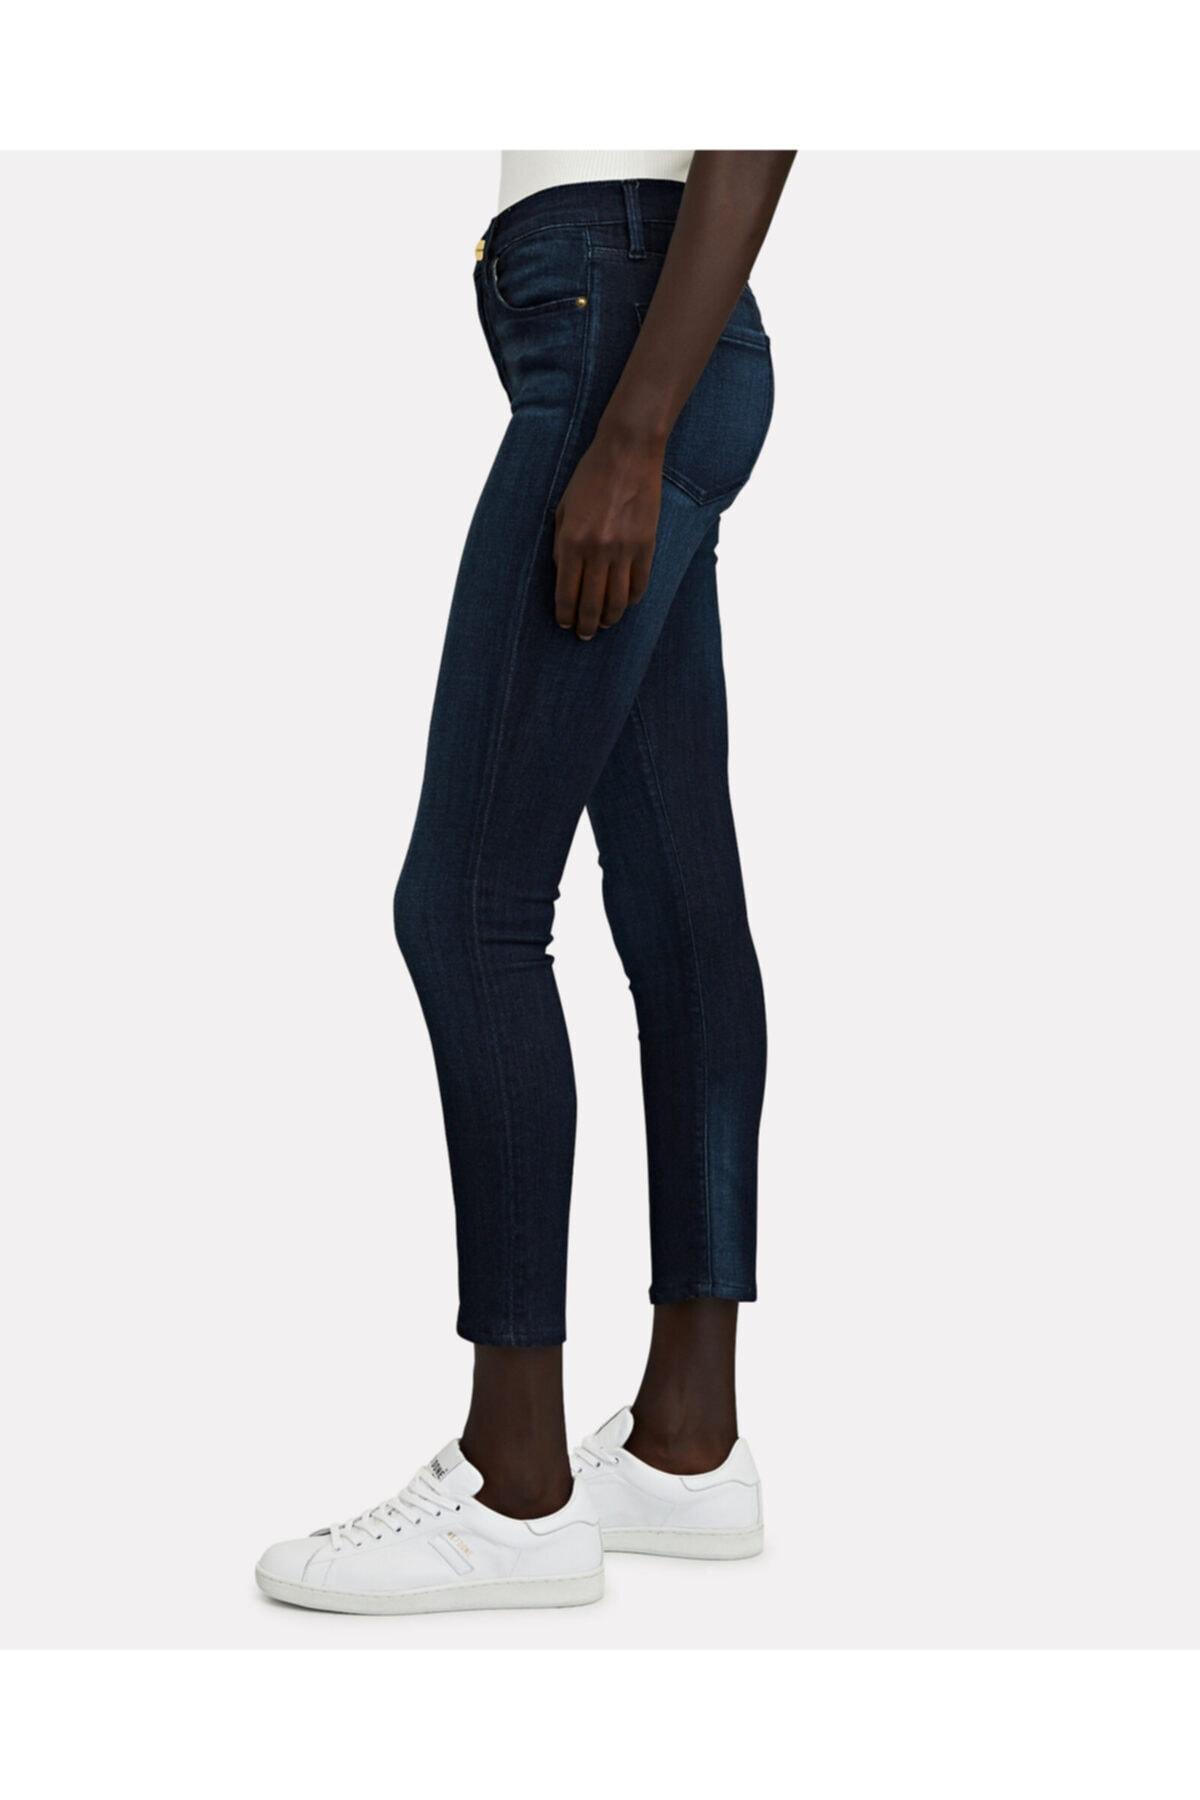 Only Frame Yüksek Bel Skınny Jean 1